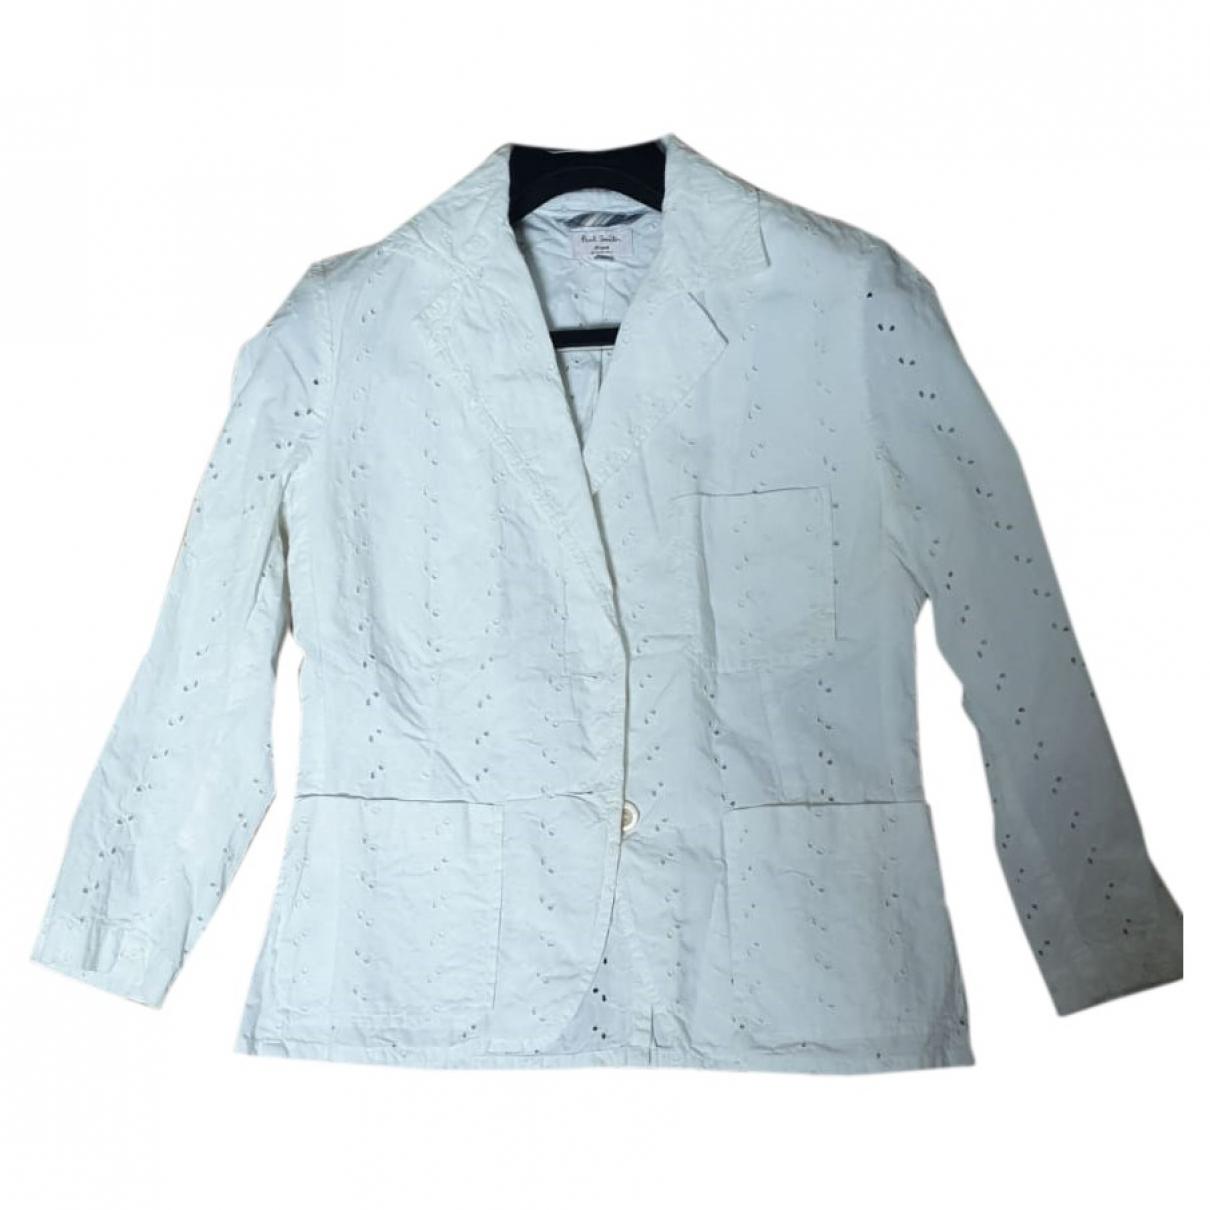 Paul Smith \N White Cotton jacket for Women 44 IT